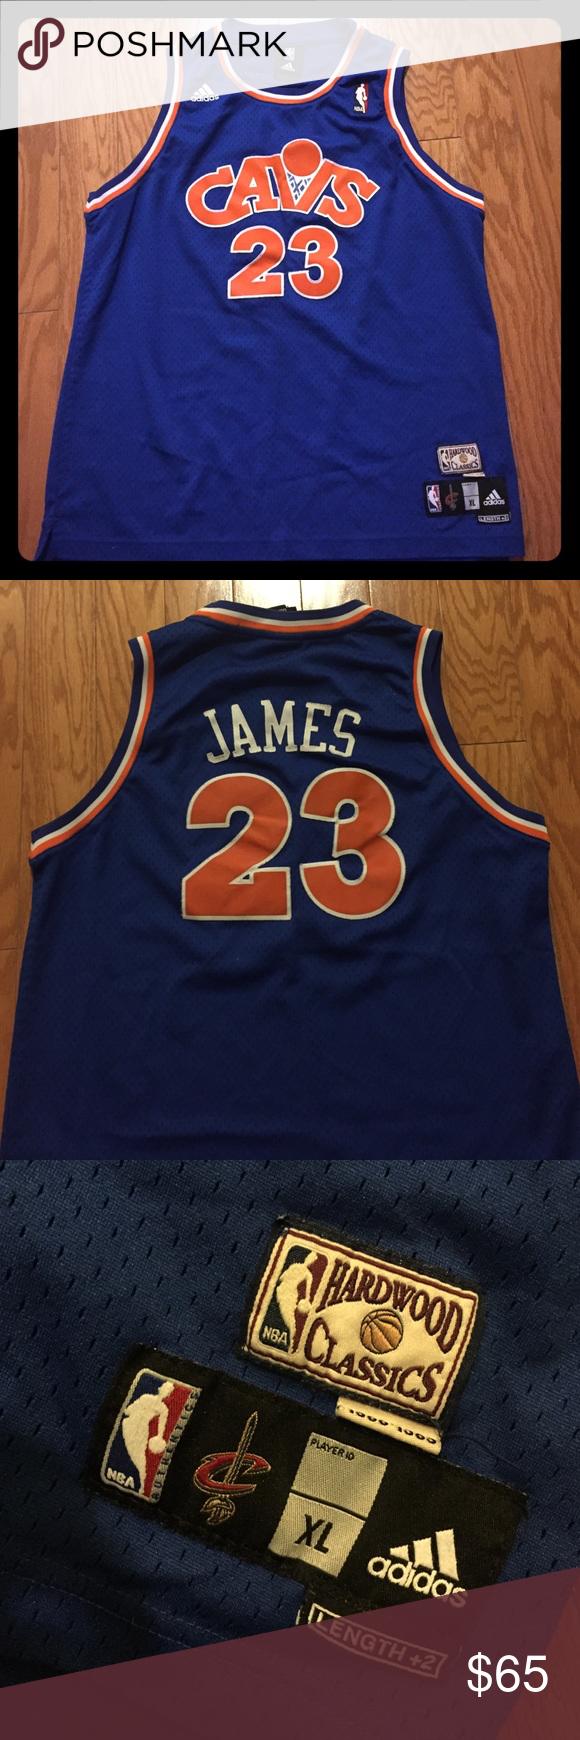 714e91ce45f4 Lebron James- Hardwood Classics Throwback Jersey Lebron James- adidas NBA-  Size youth XL